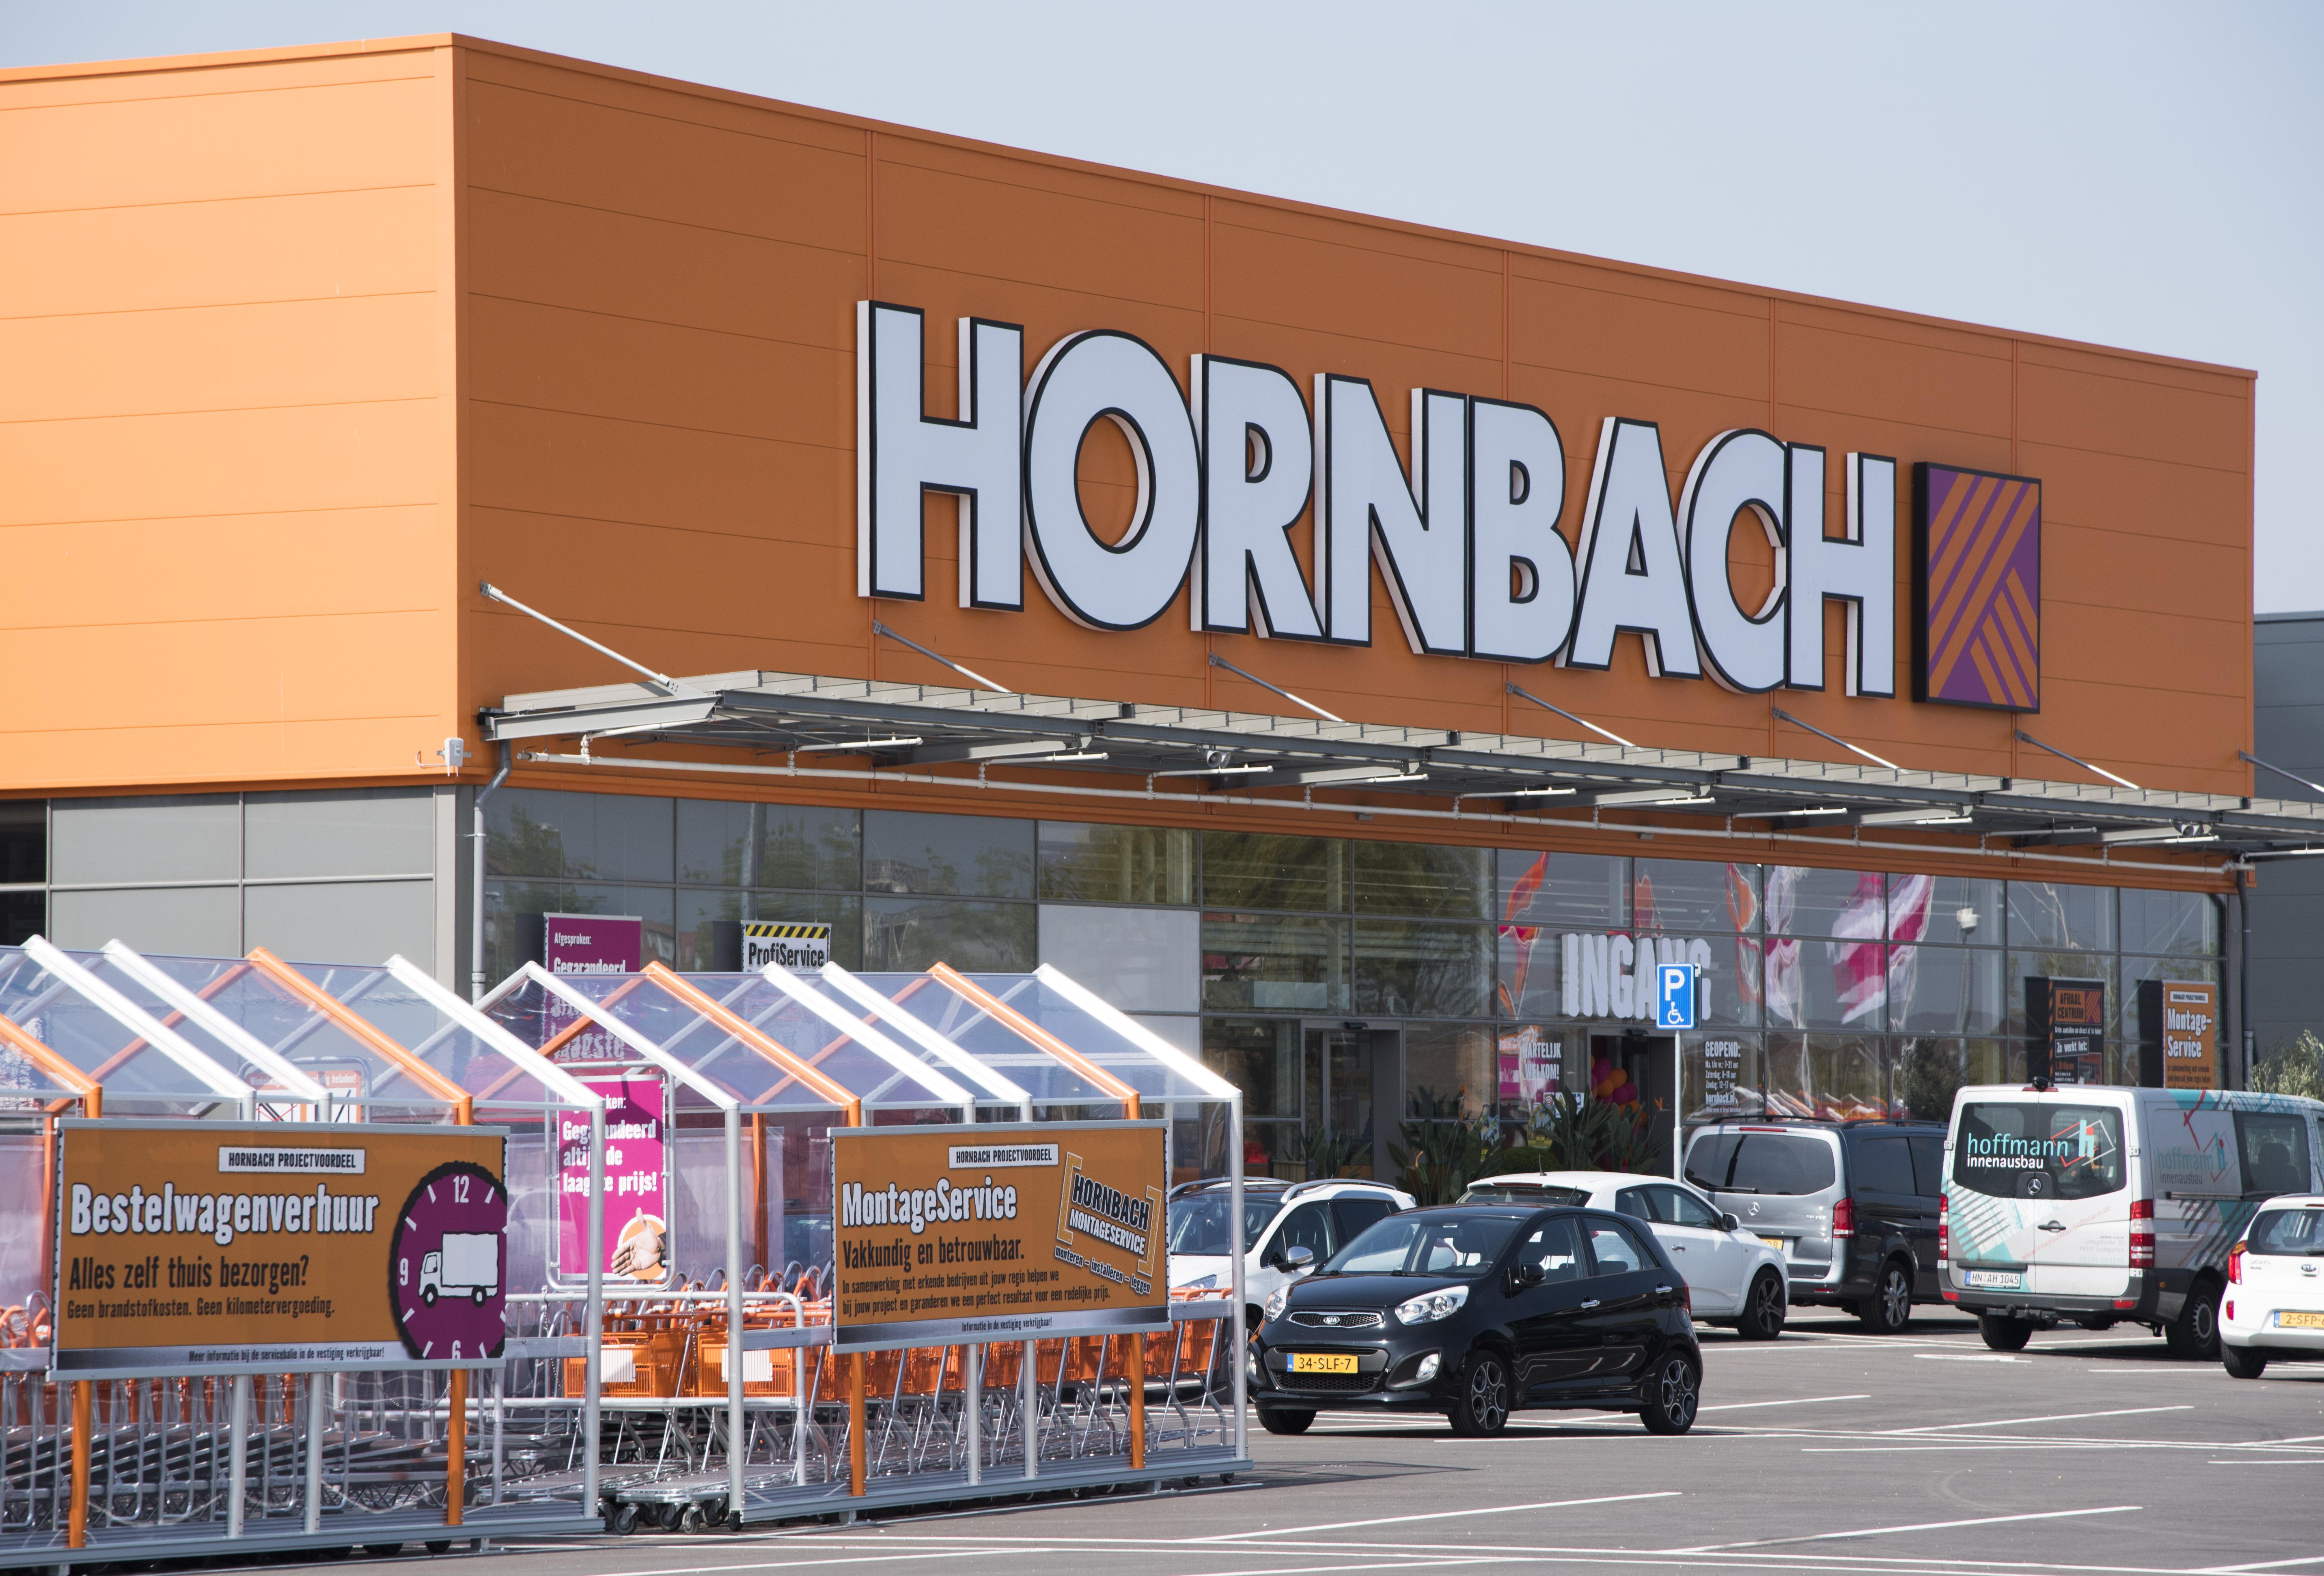 hornbach den haag single 115)